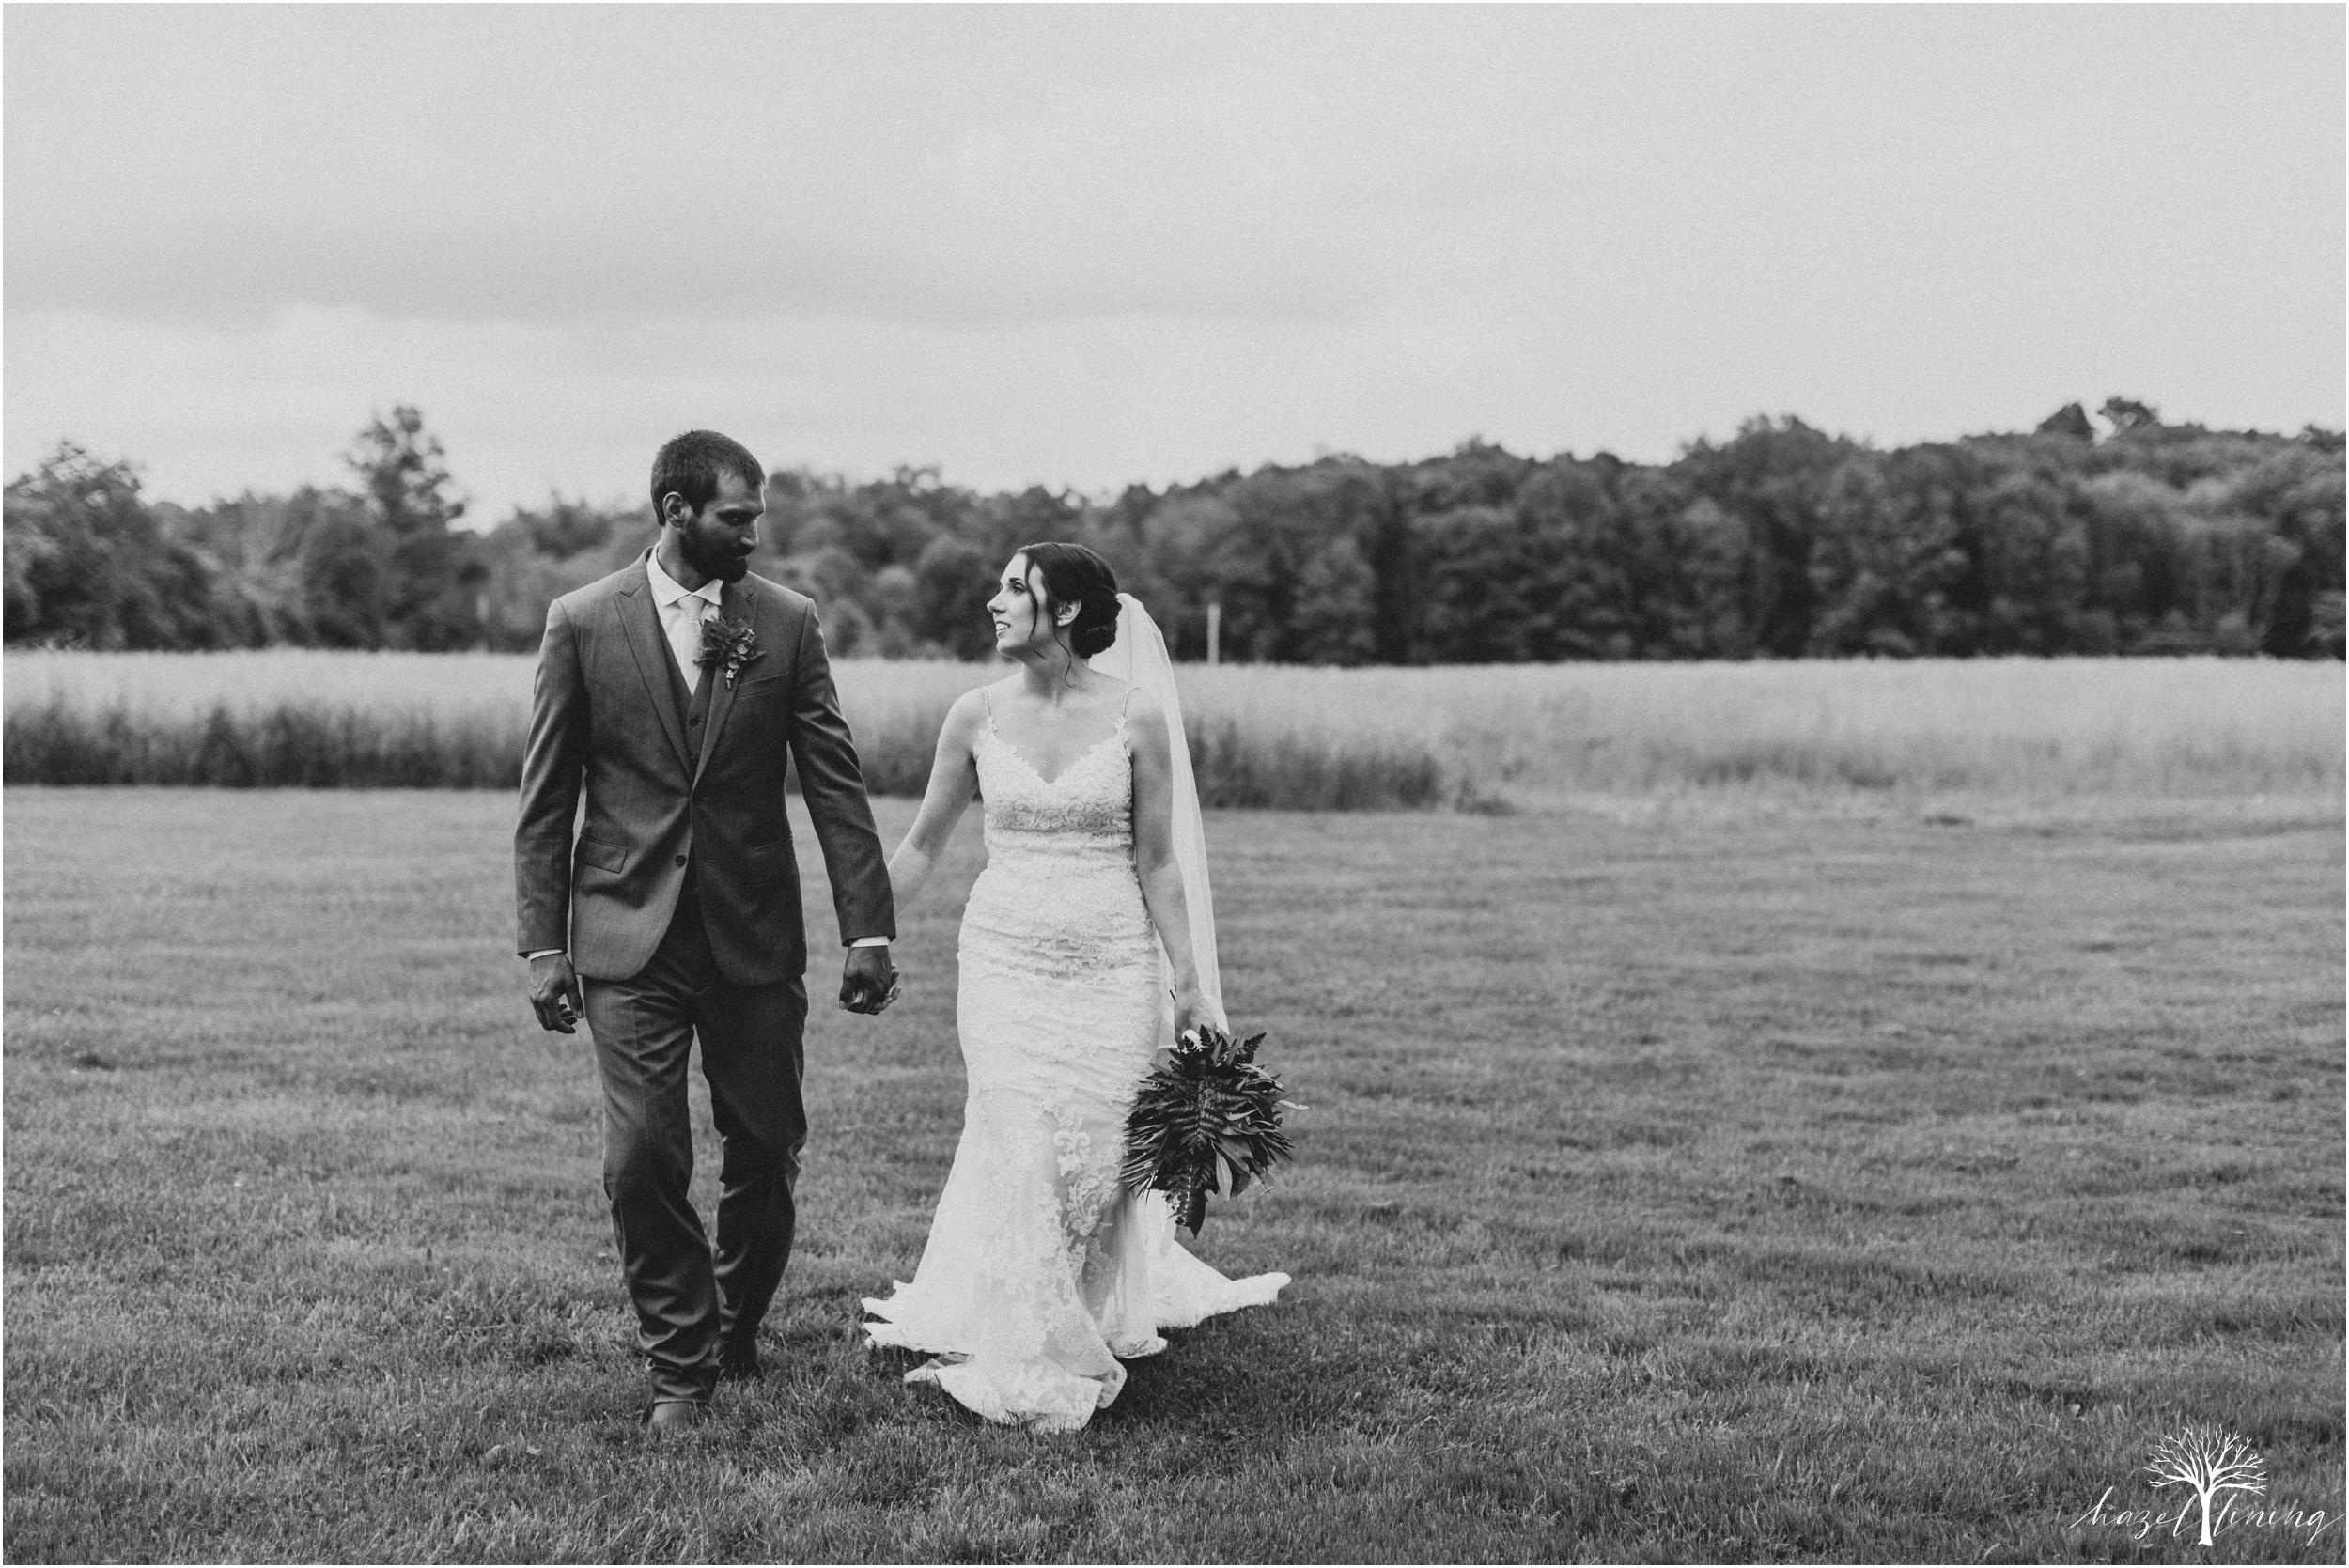 hazel-lining-travel-wedding-elopement-photography-lisa-landon-shoemaker-the-farm-bakery-and-events-bucks-county-quakertown-pennsylvania-summer-country-outdoor-farm-wedding_0093.jpg